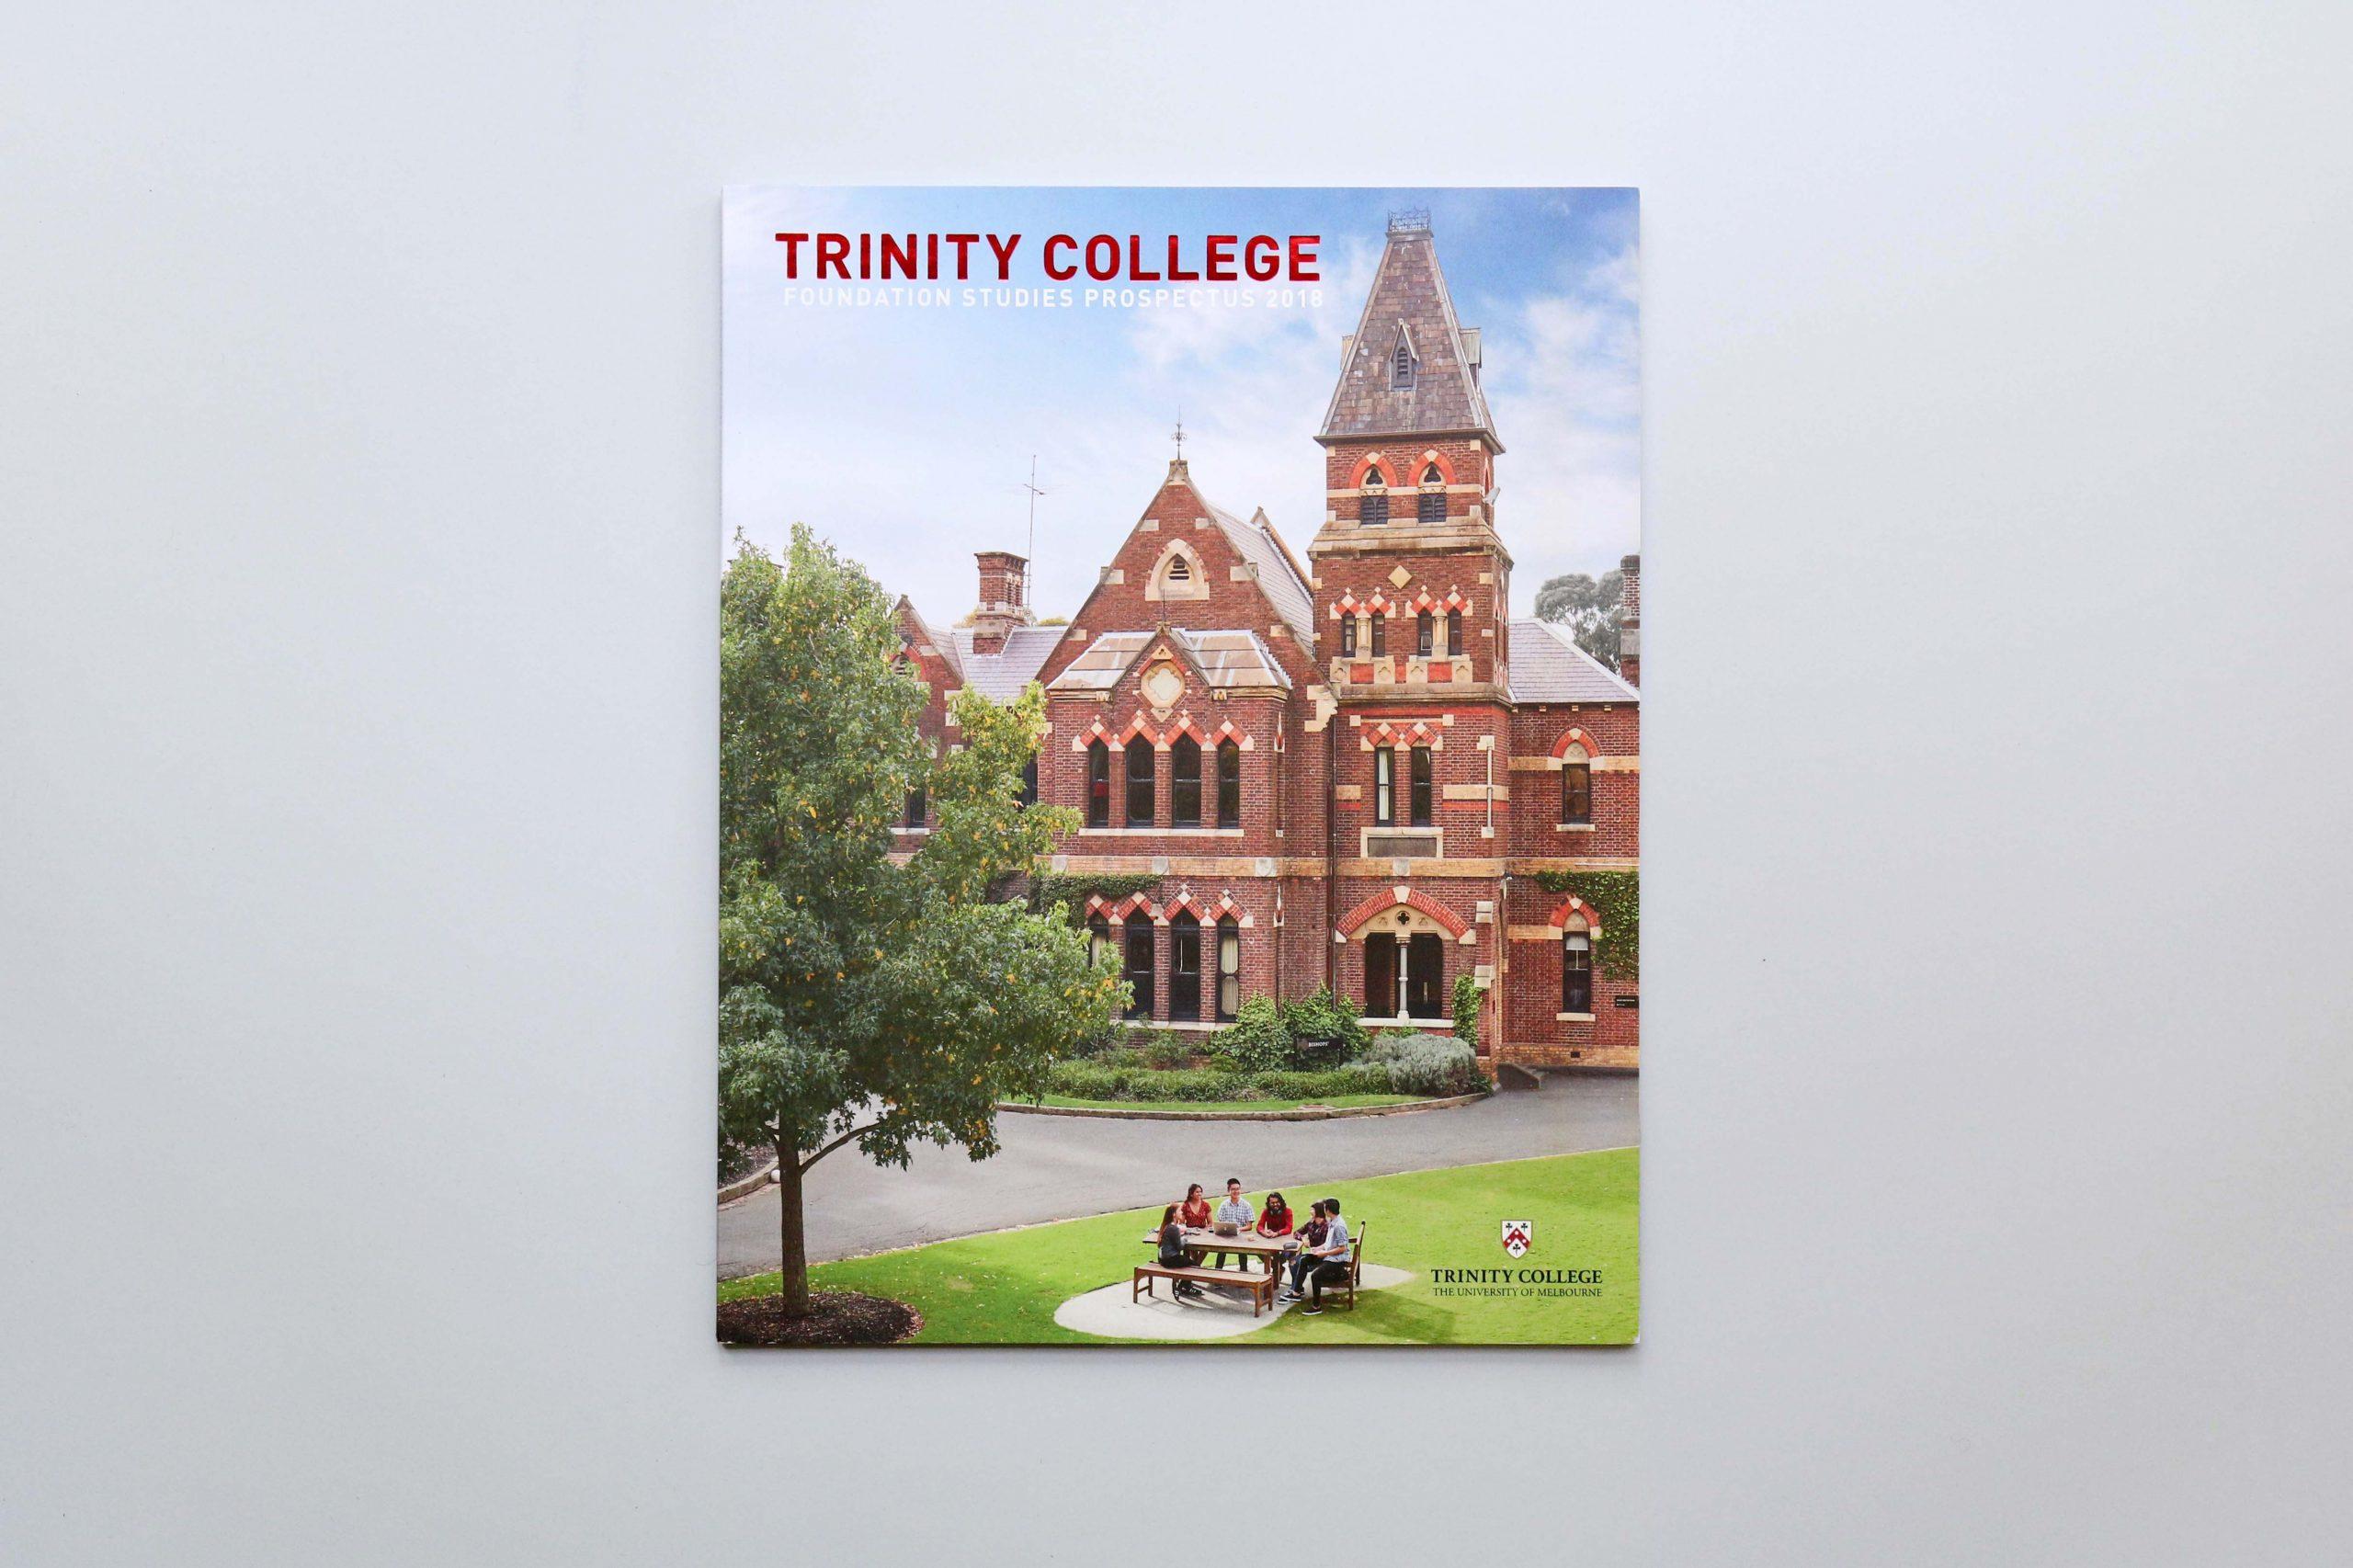 Trinity College Foundation Studies Prospectus